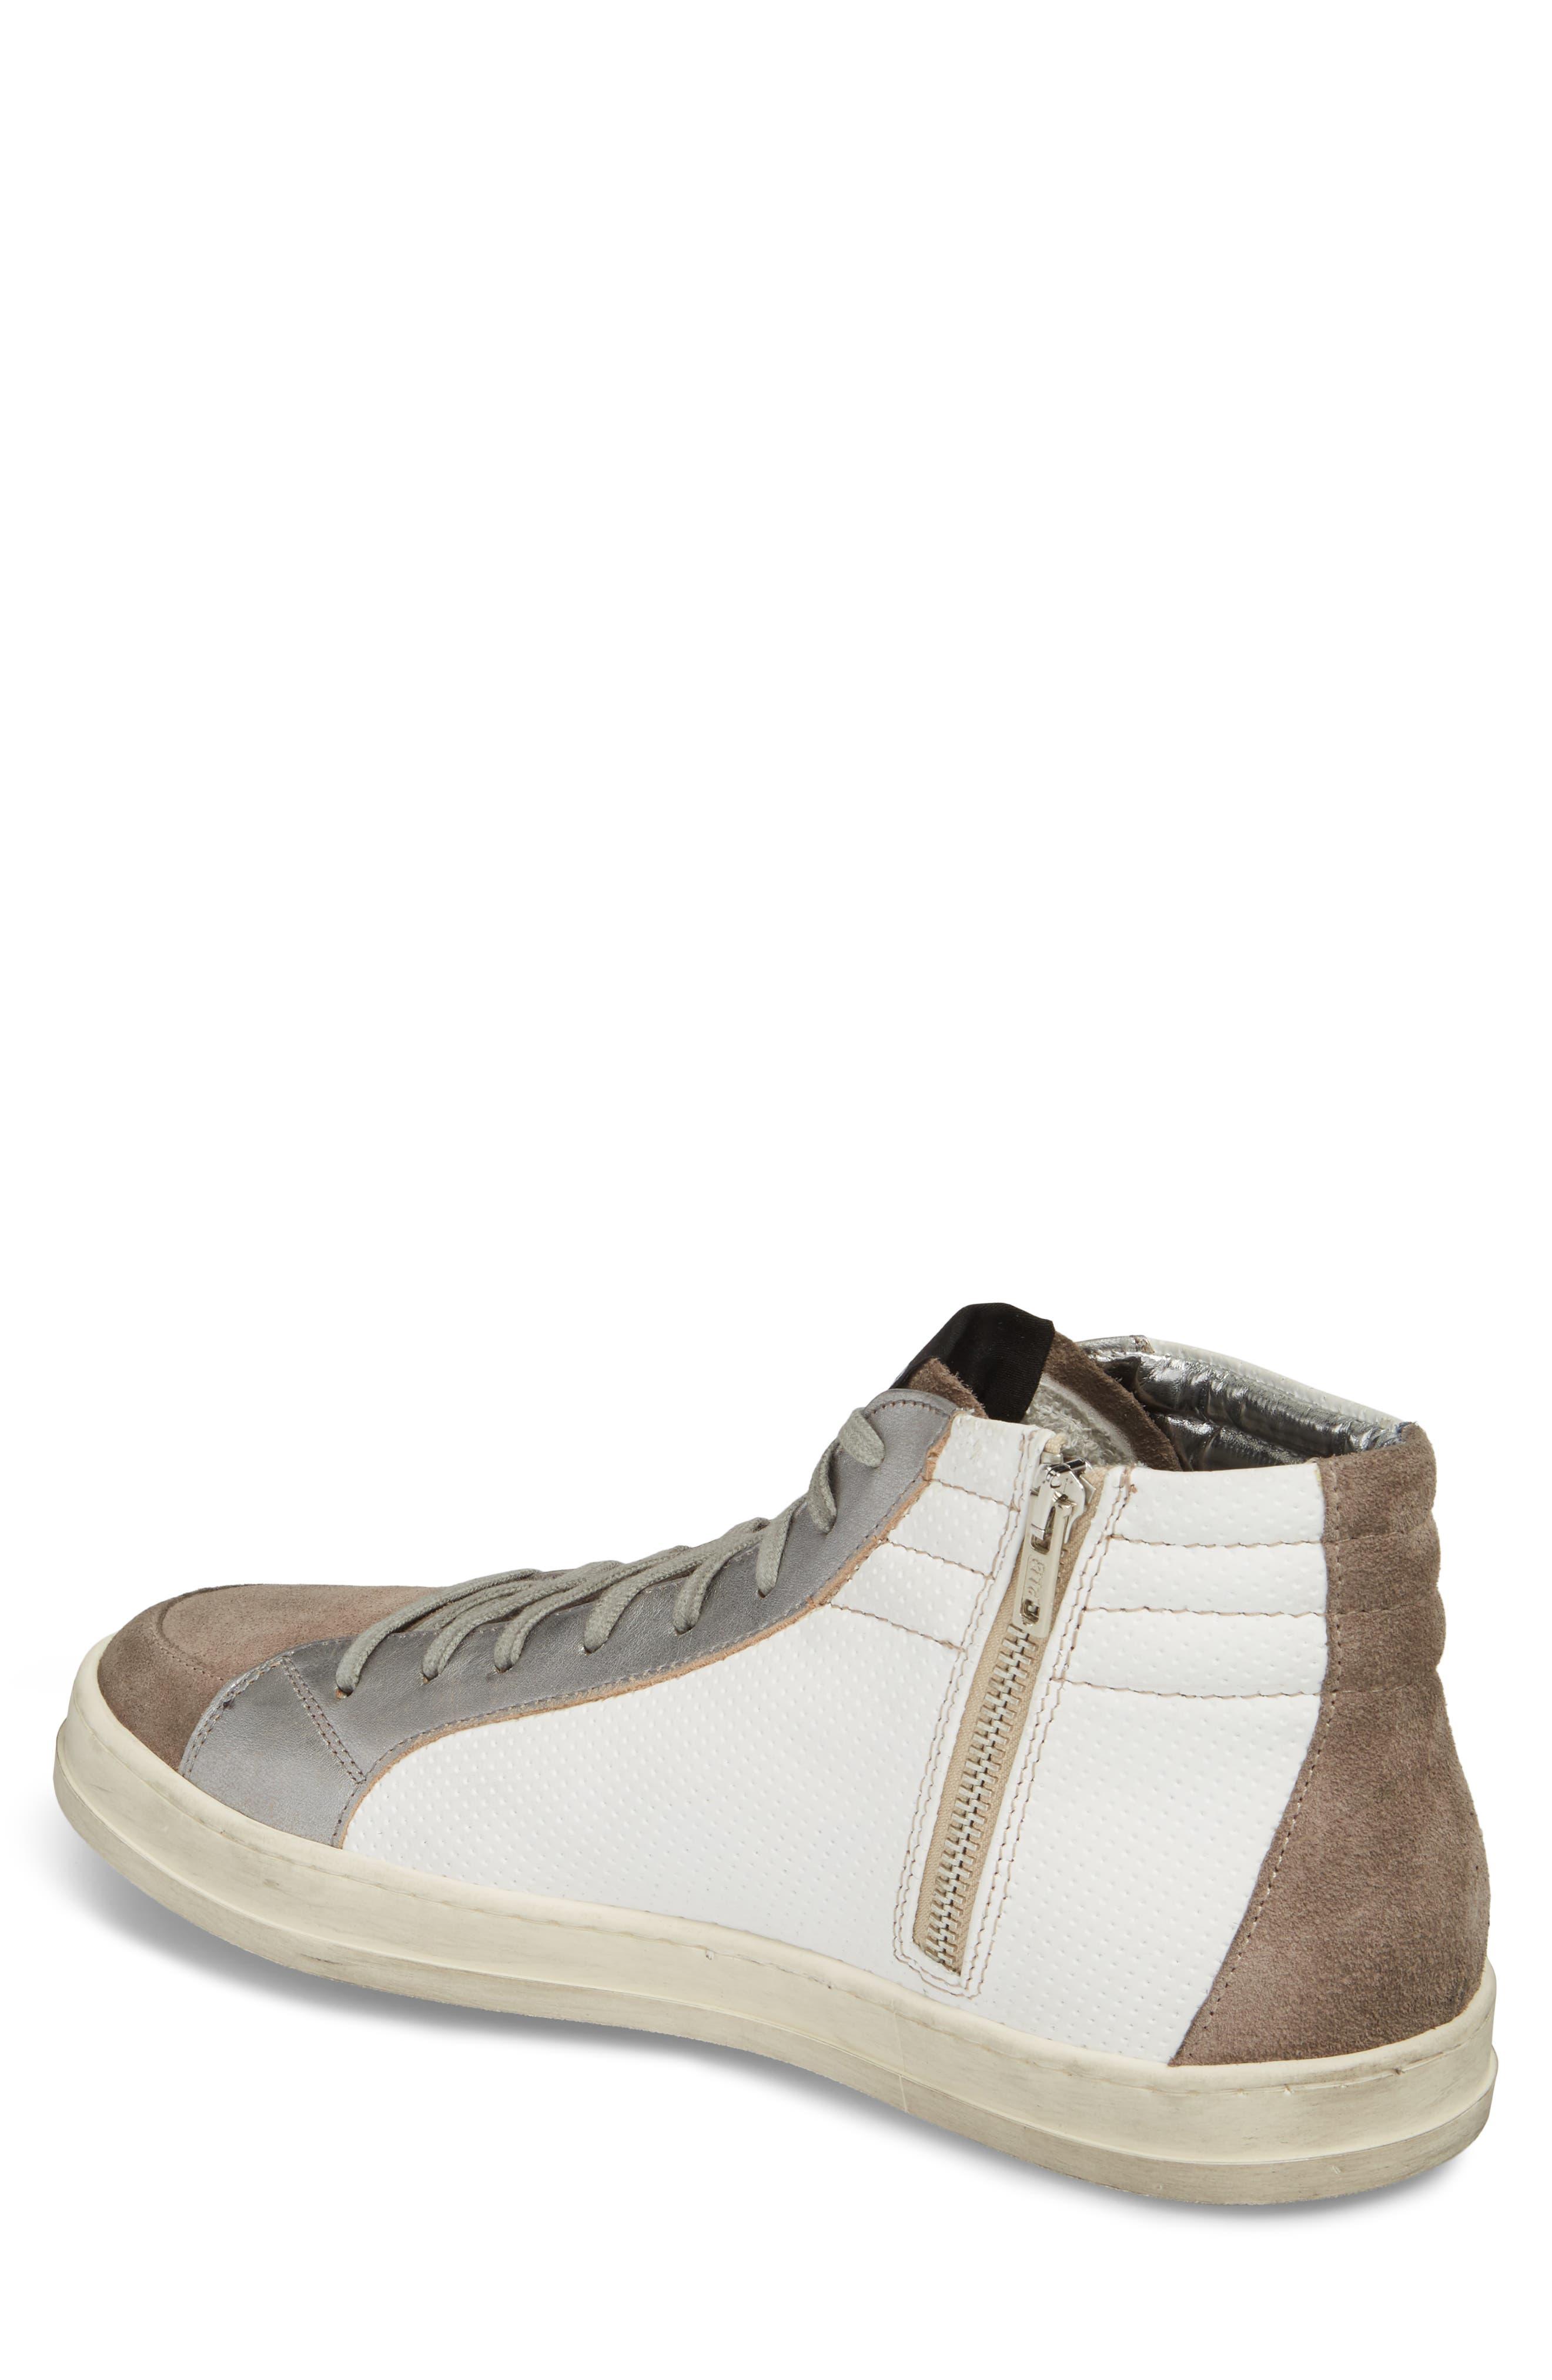 P448,                             Skate High Top Sneaker,                             Alternate thumbnail 2, color,                             111